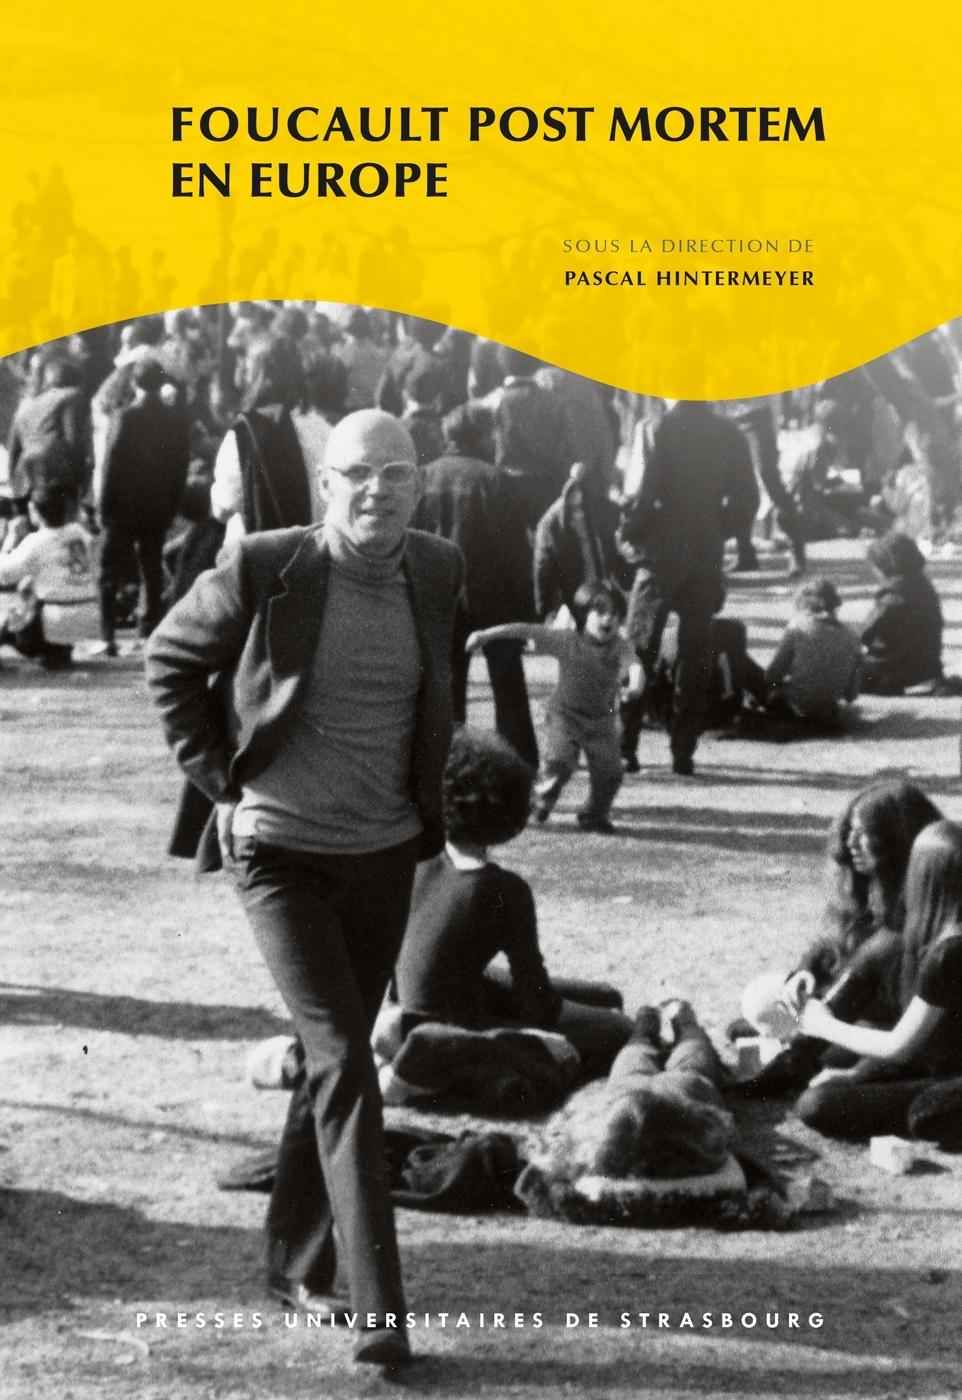 P. Hintermeyer (dir.), Foucault post mortem en Europe